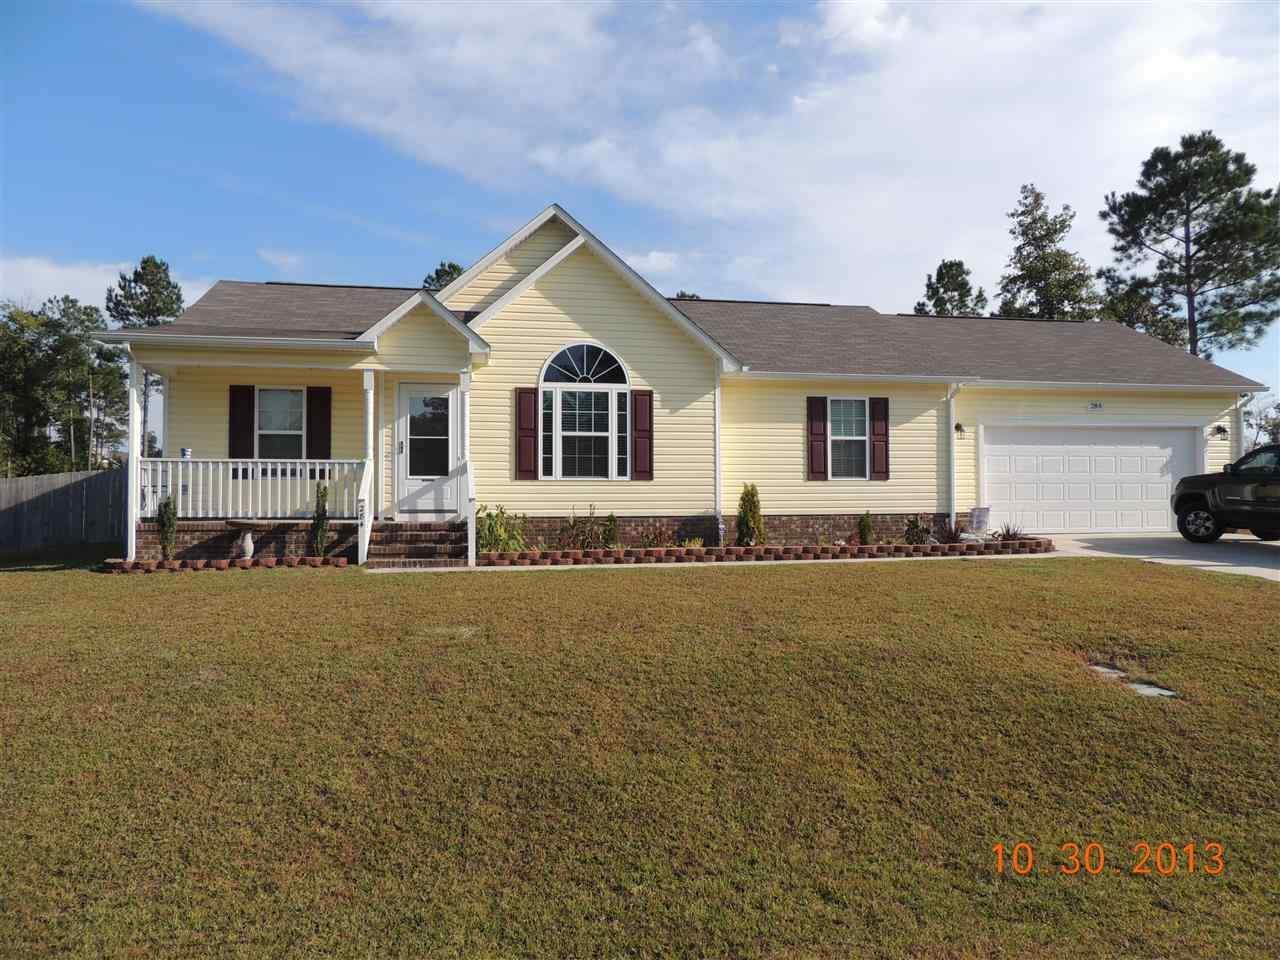 284 Brookstone Way, Jacksonville, NC 28546 For Rent | Trulia